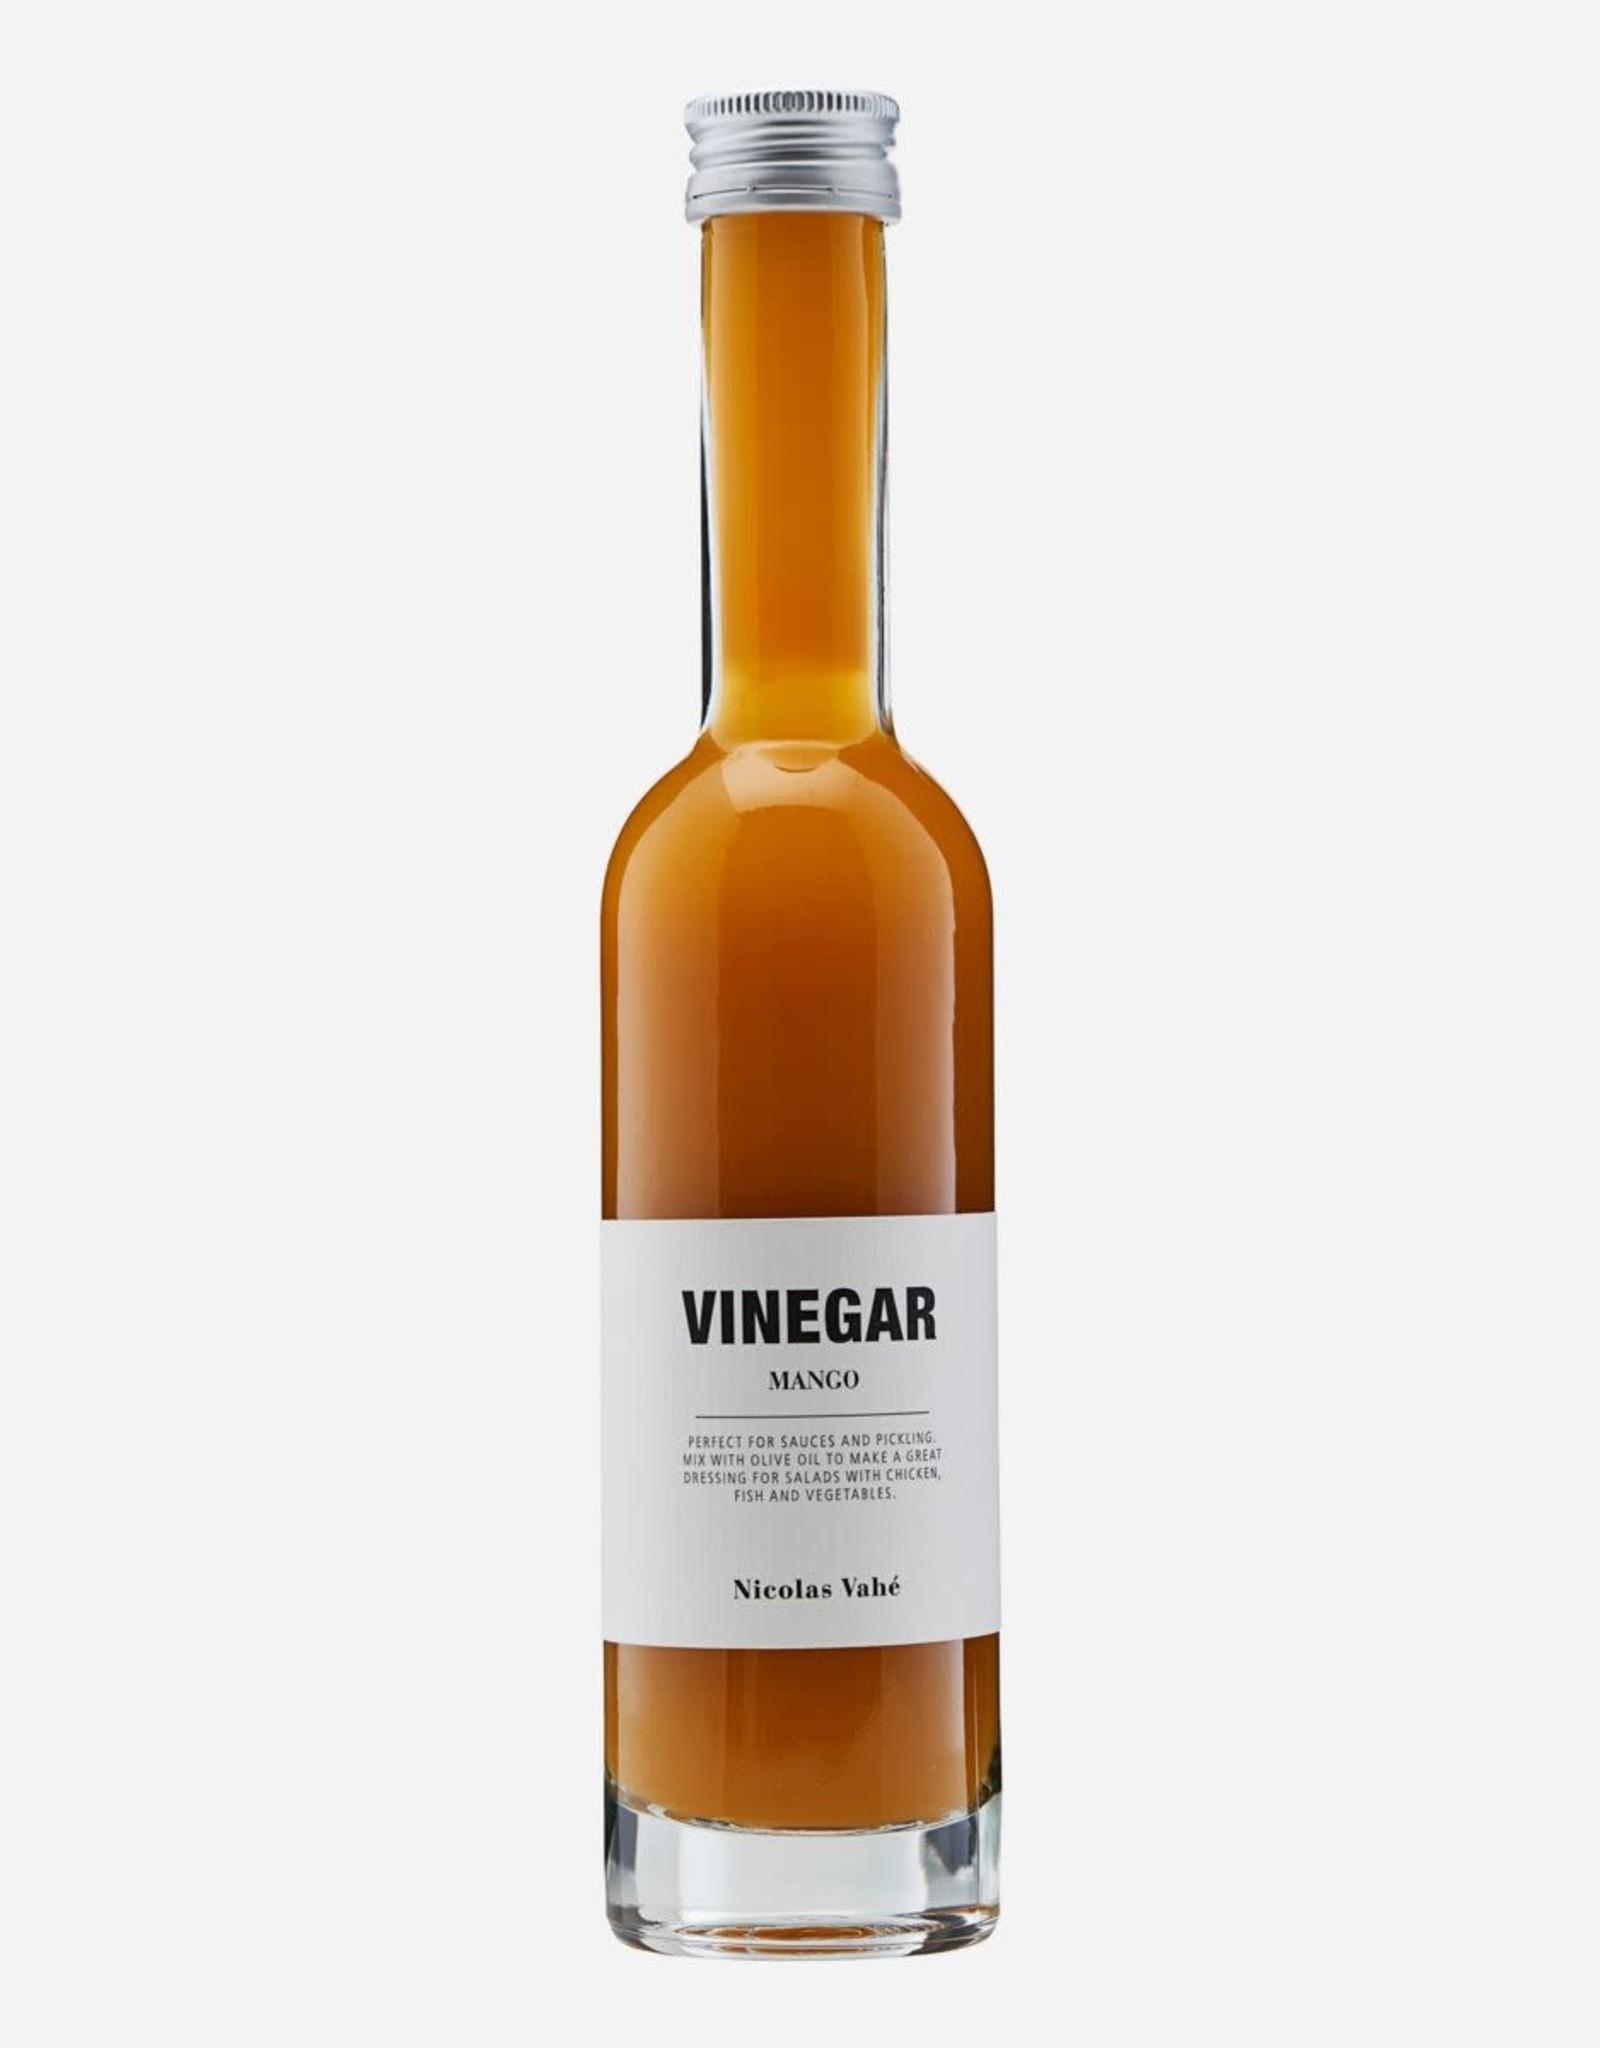 Nicolas Vahé Nicolas Vahé Vinegar Mango